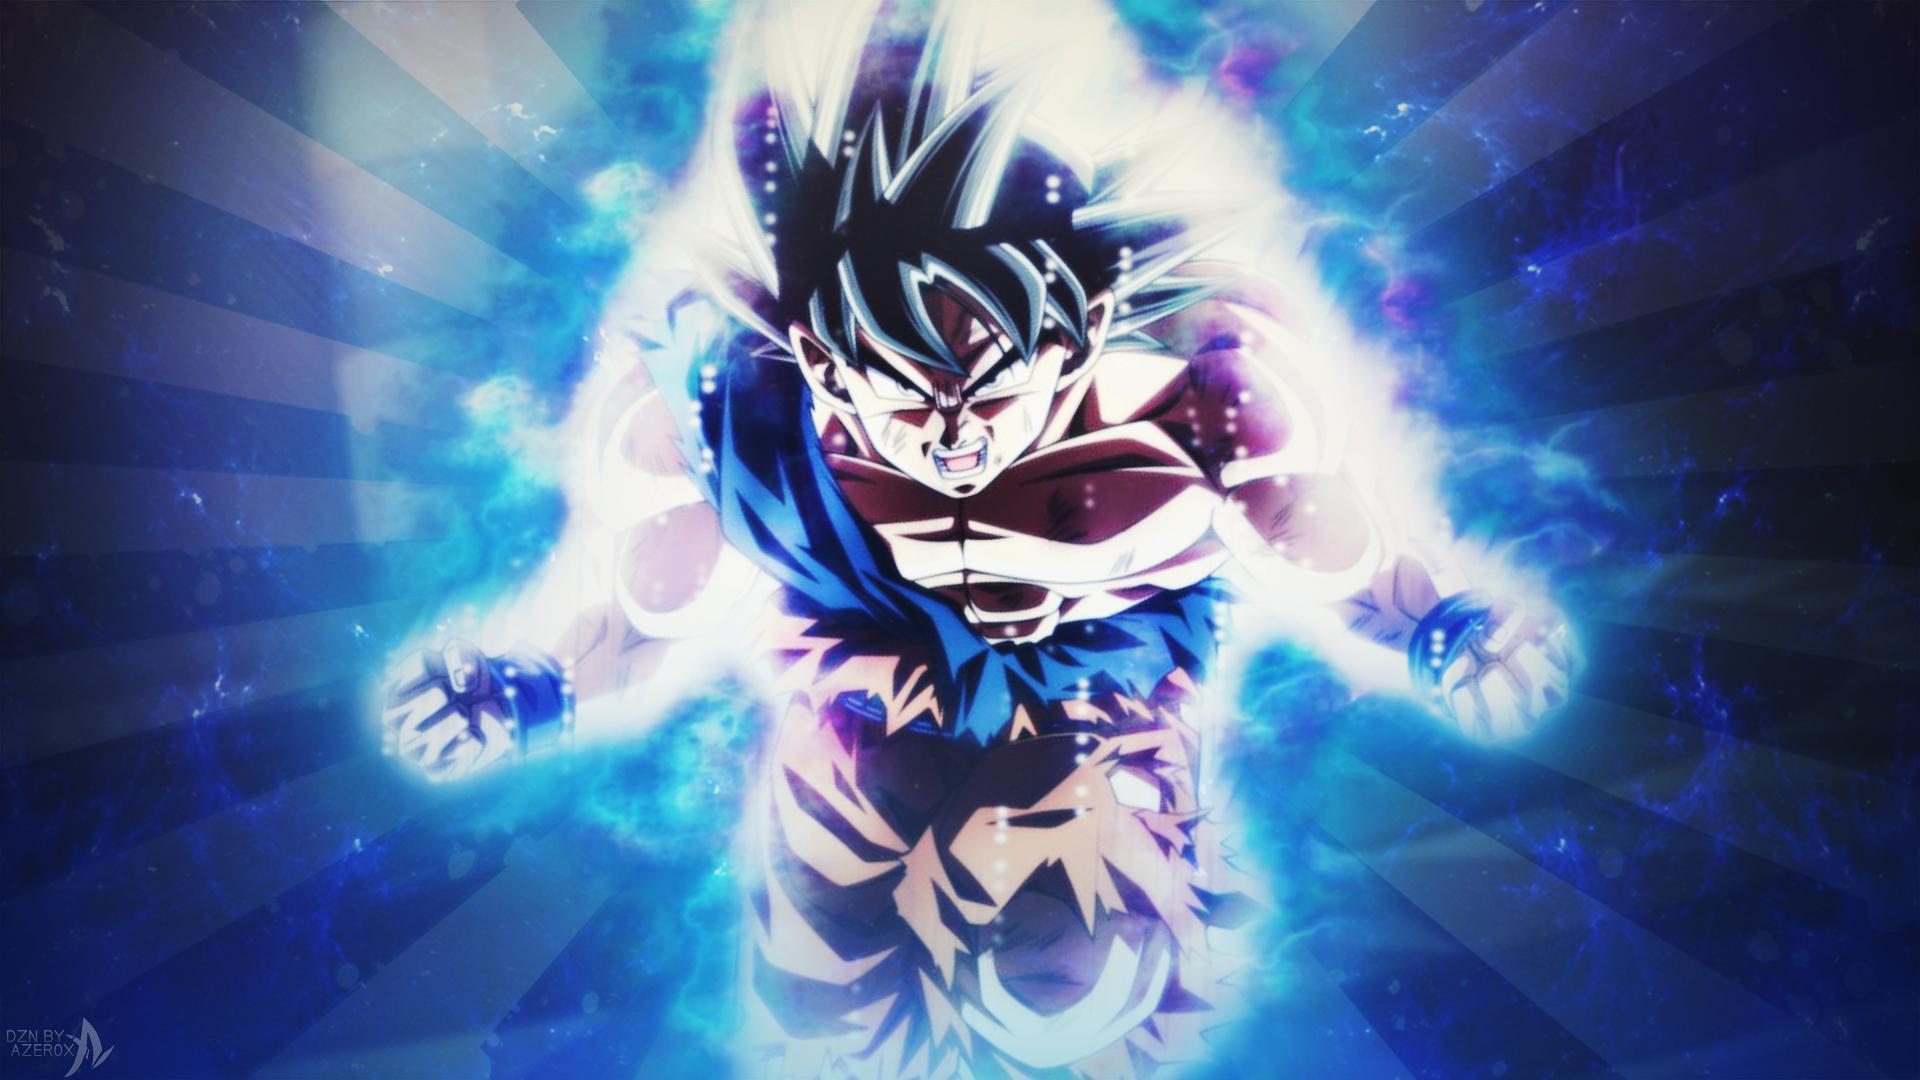 Goku Ultra Instinct Wallpapers 1920x1080